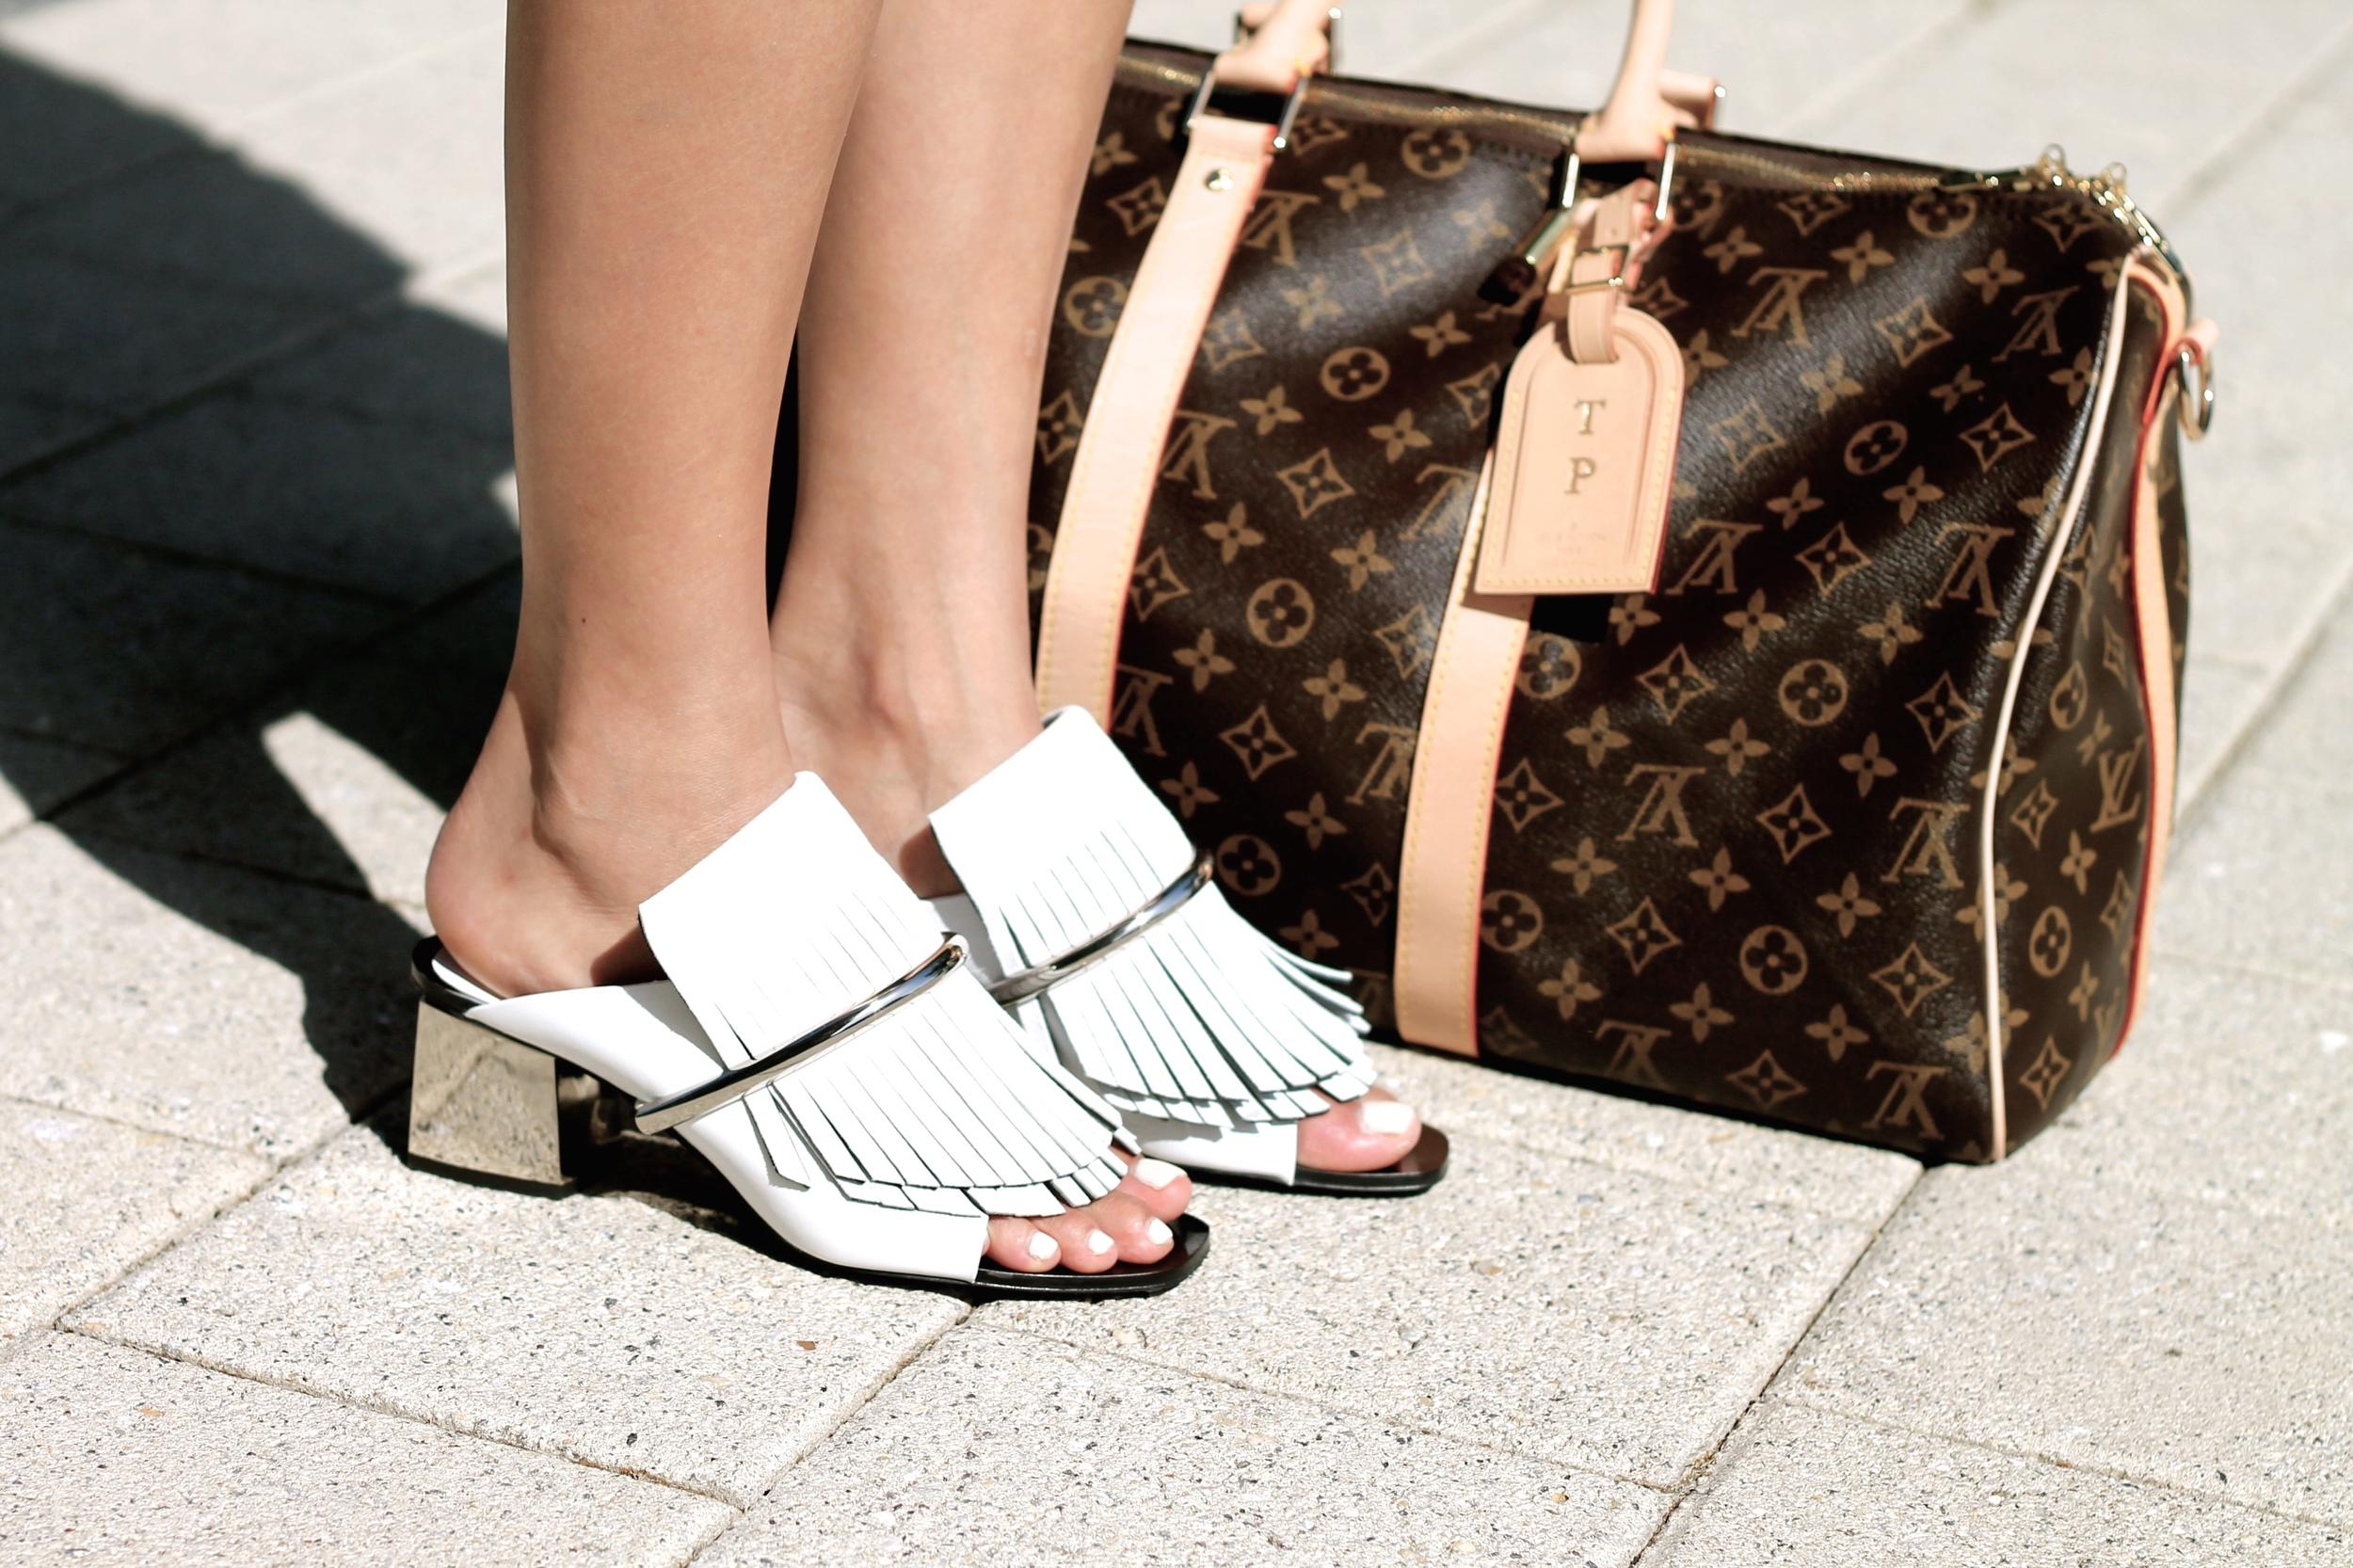 Proenza Schouler shoes, Louis Vuitton bag